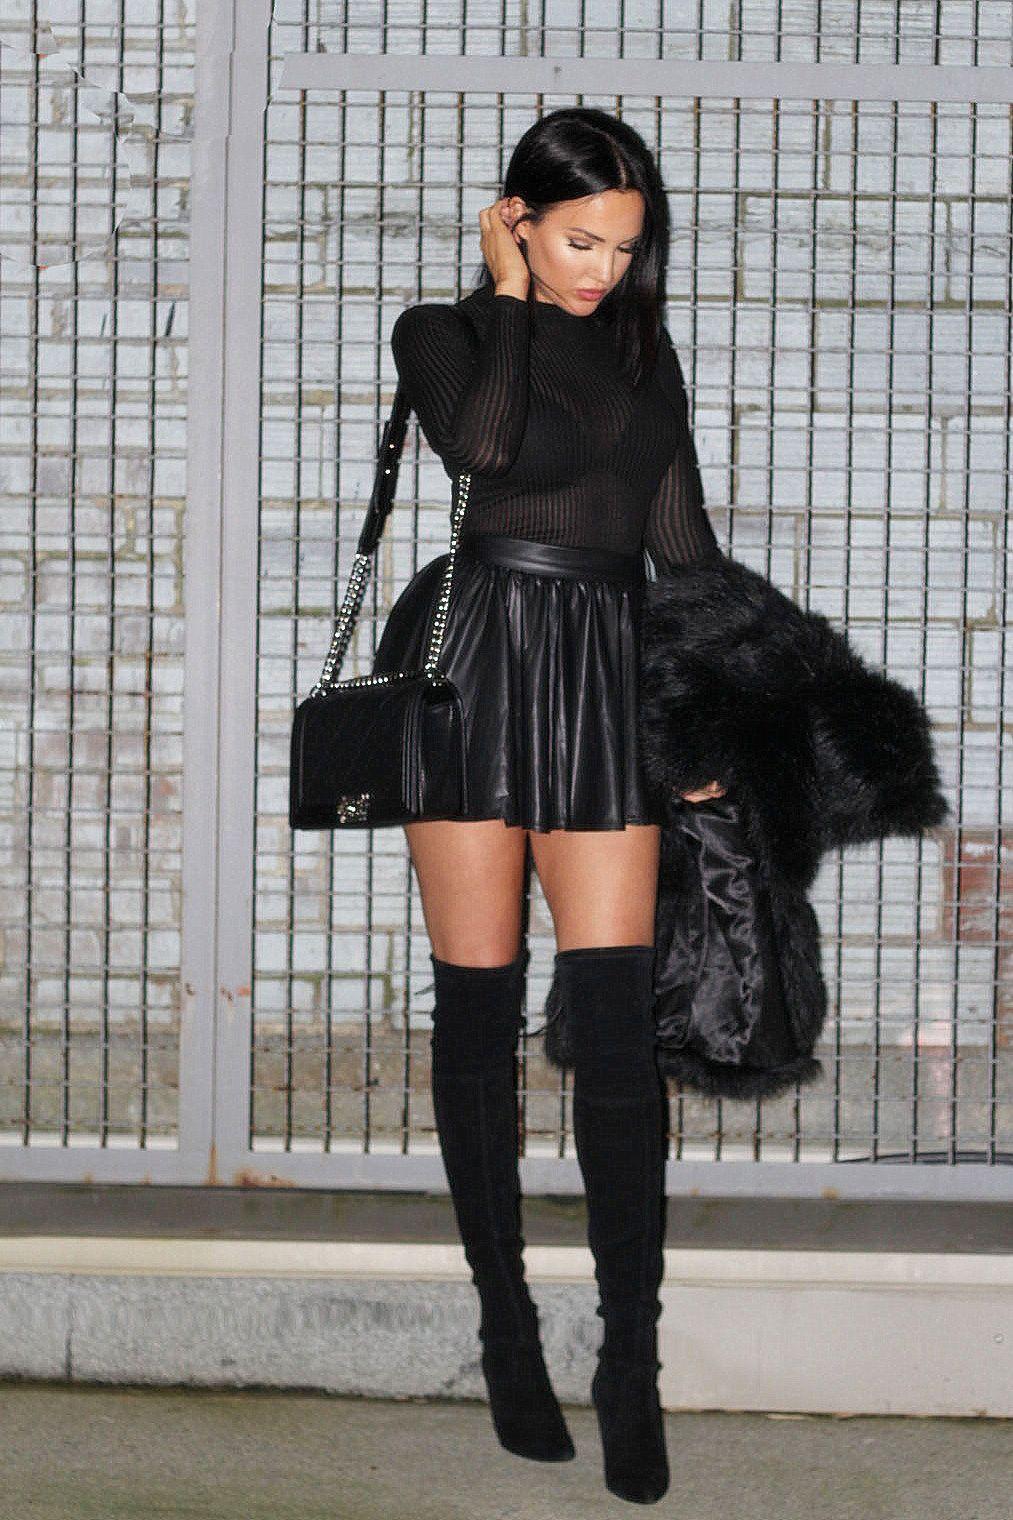 pleatedminiskirts oh my gosh that skirt those thigh